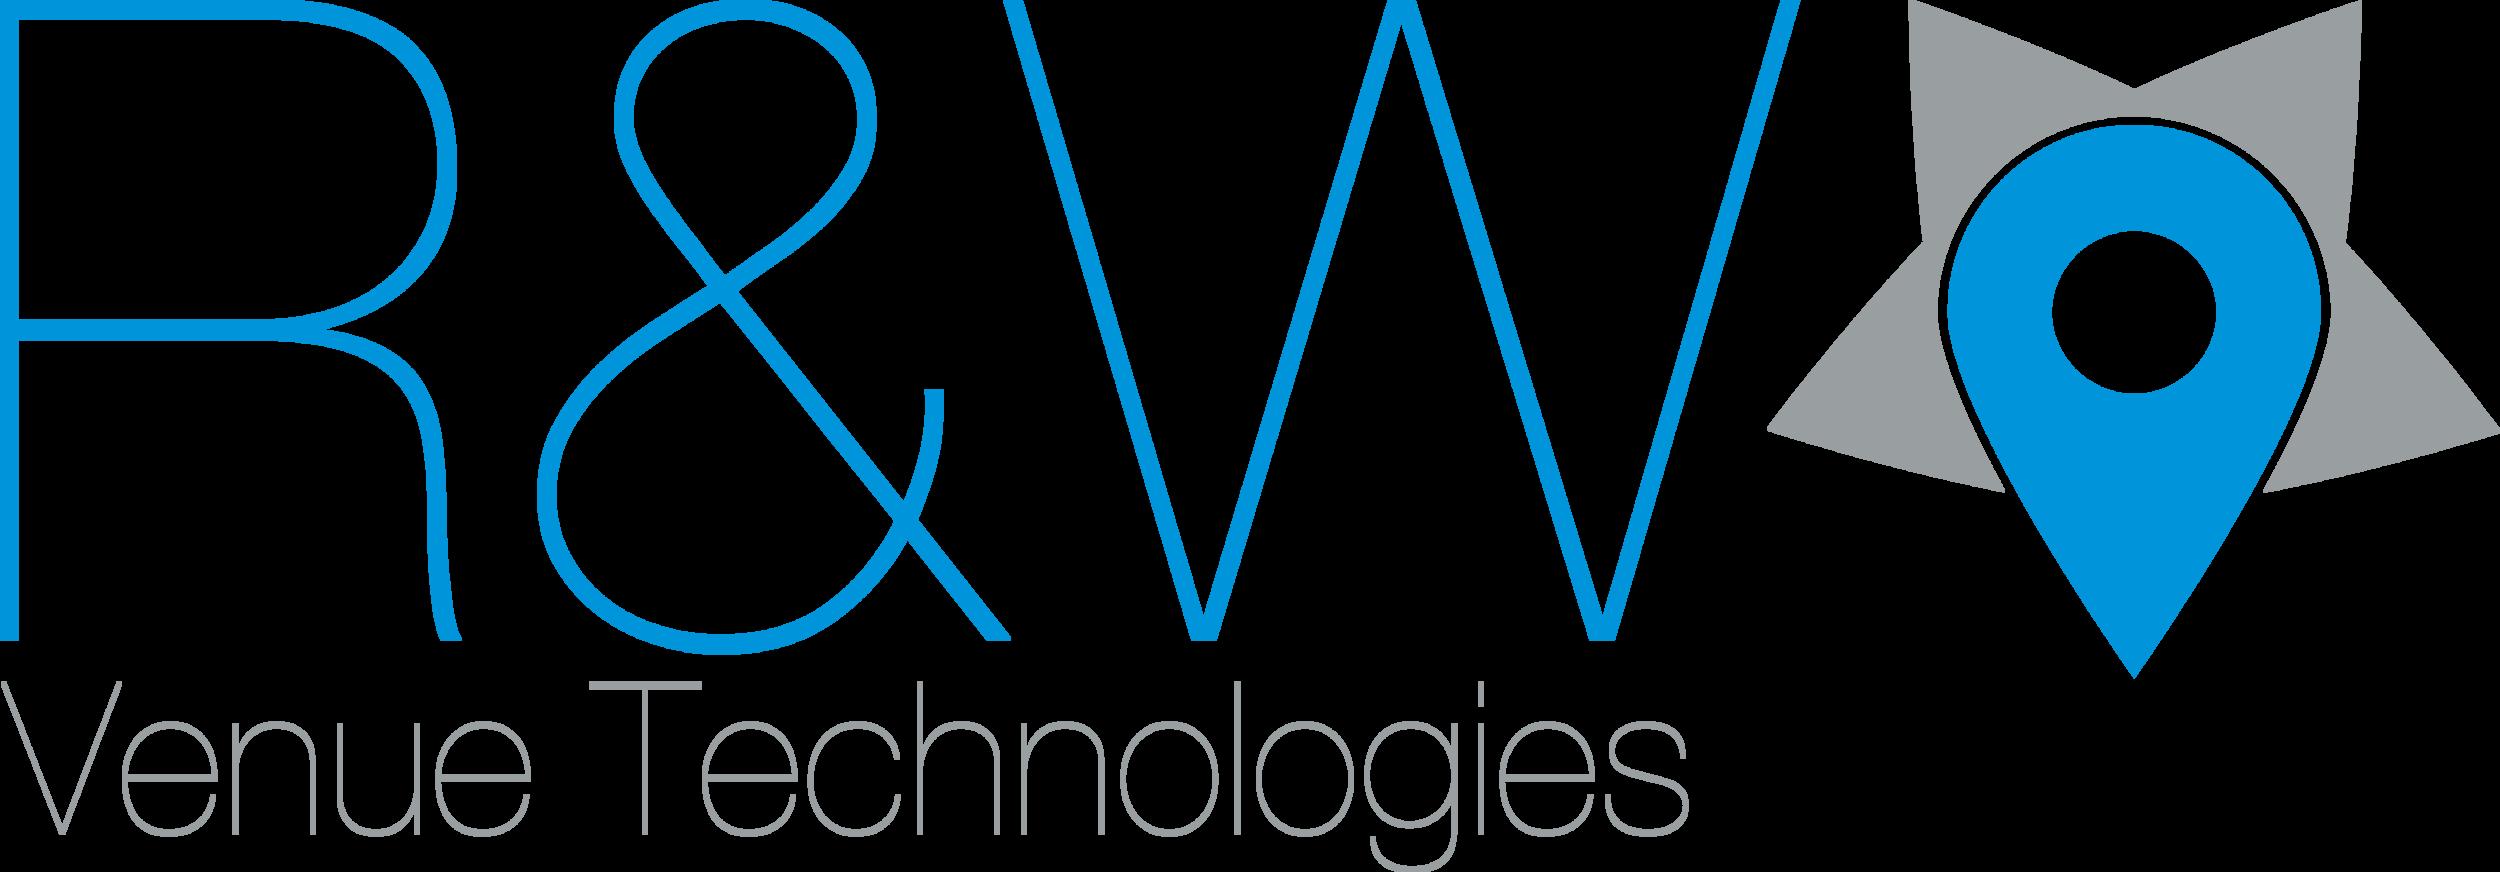 R&W-logo-RGB.png